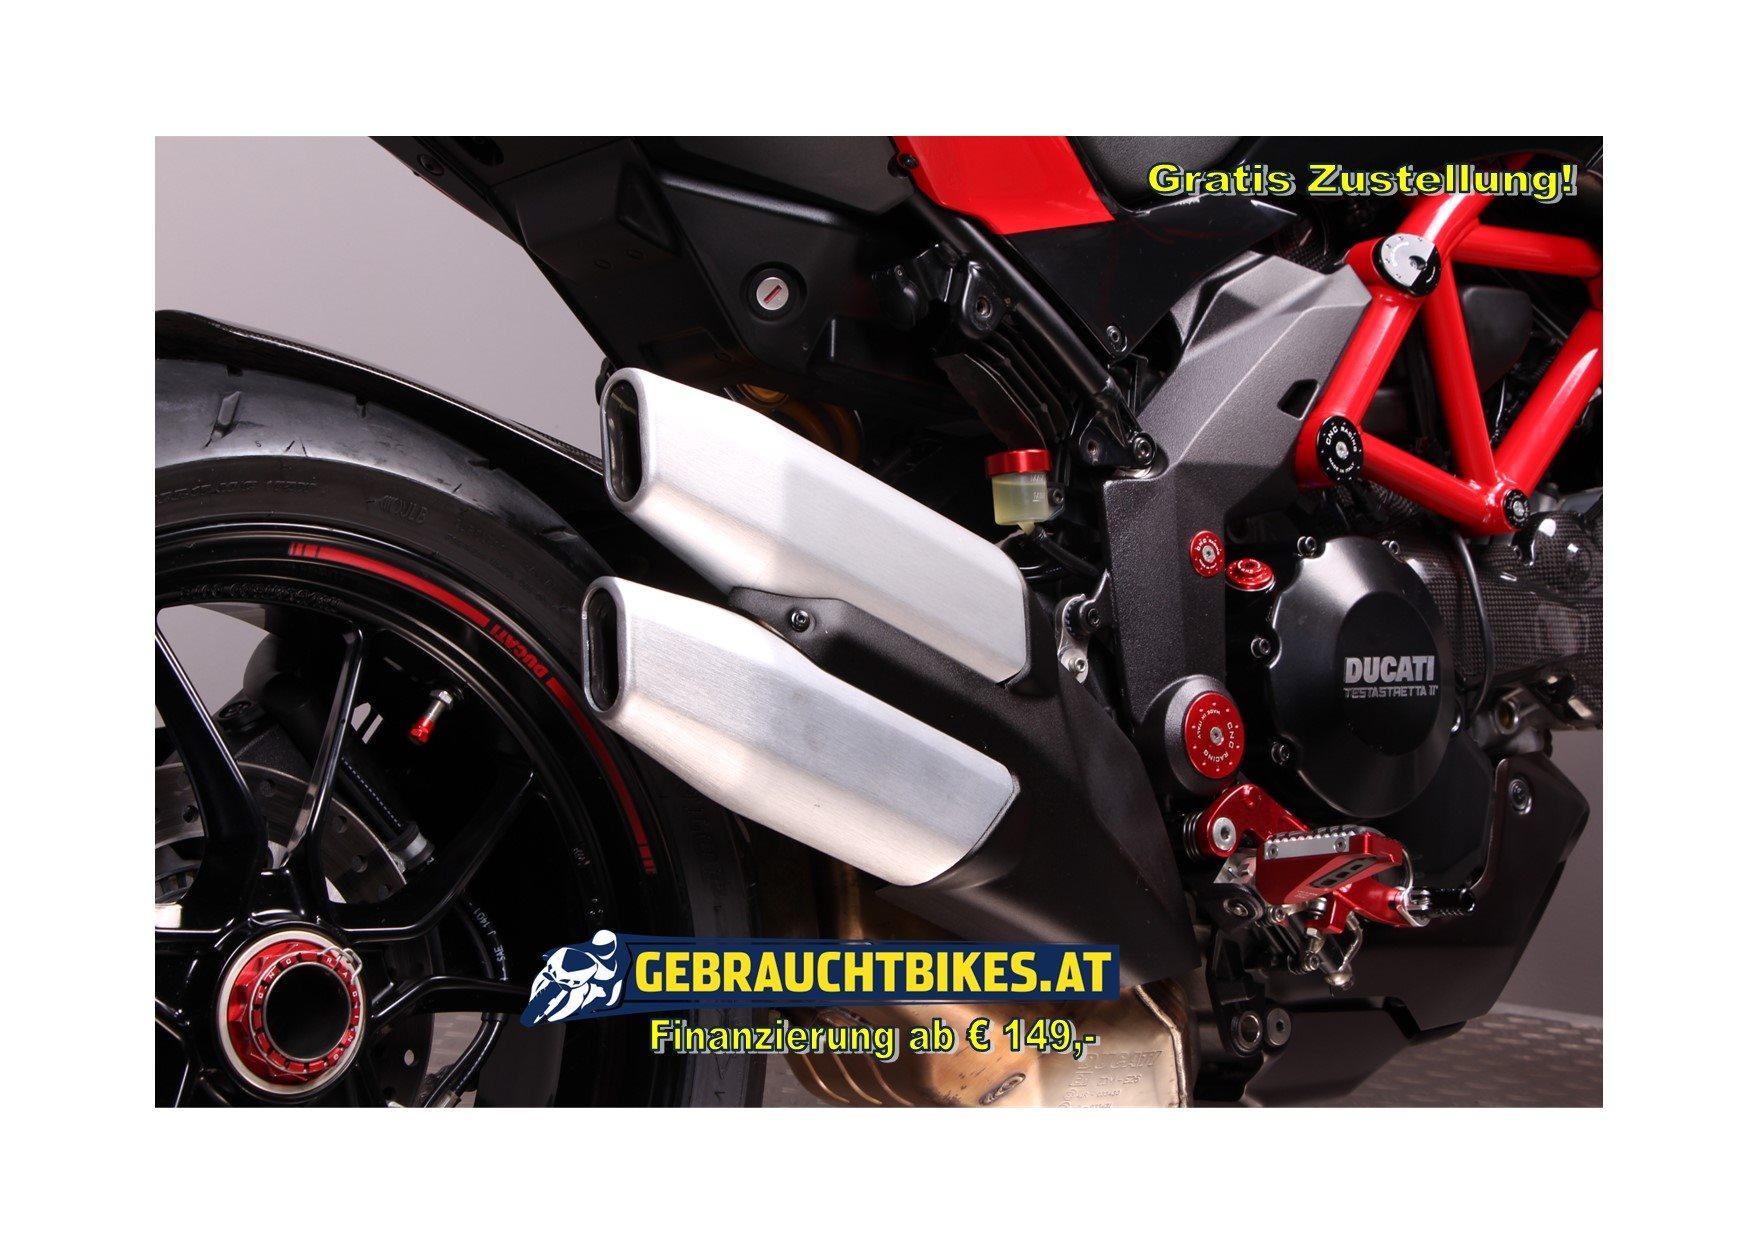 Ducati Multistrada 1200 Pikes Peak Motorrad, gebraucht